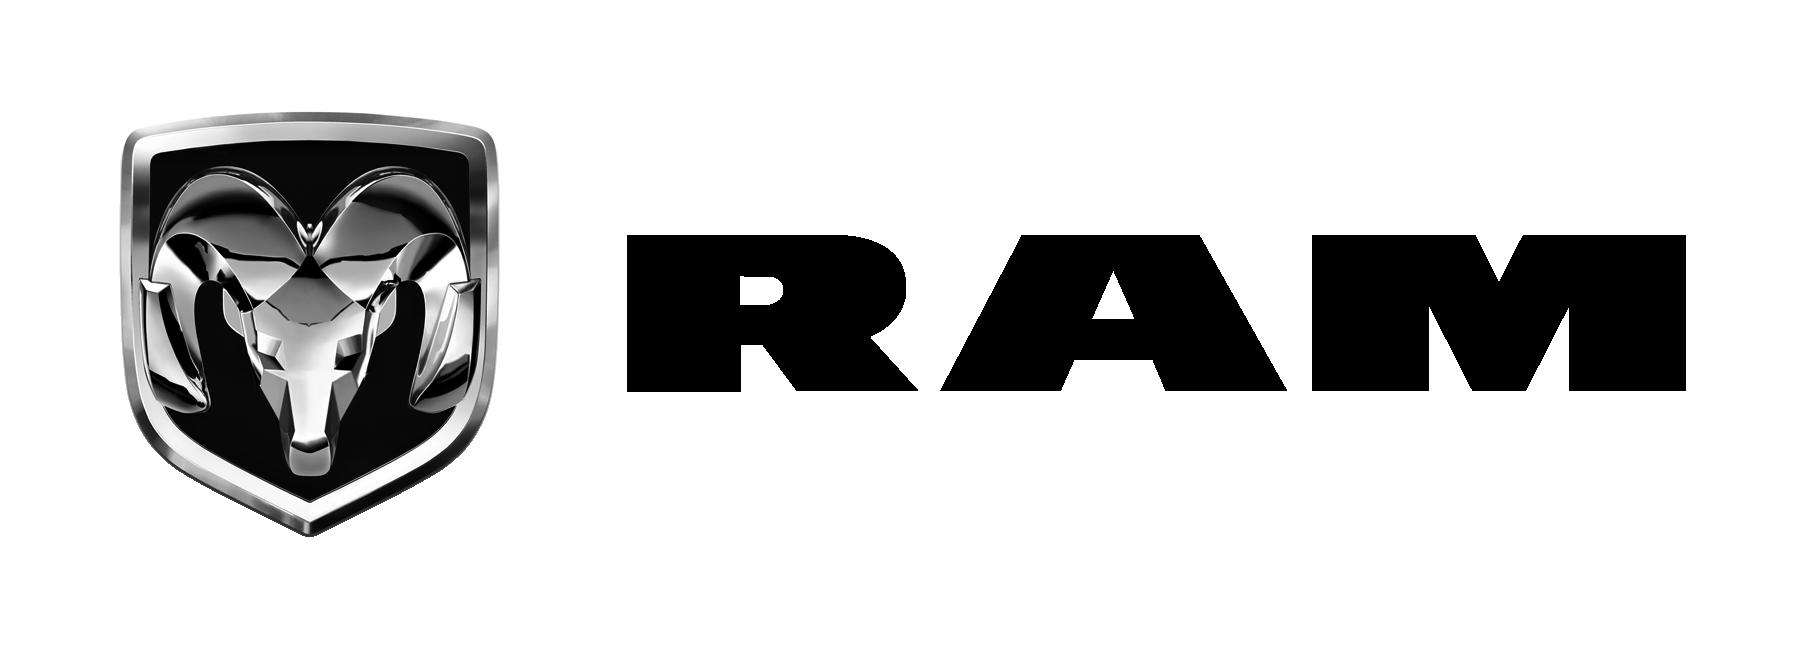 RAM_3D_Rev_Horz_black.png